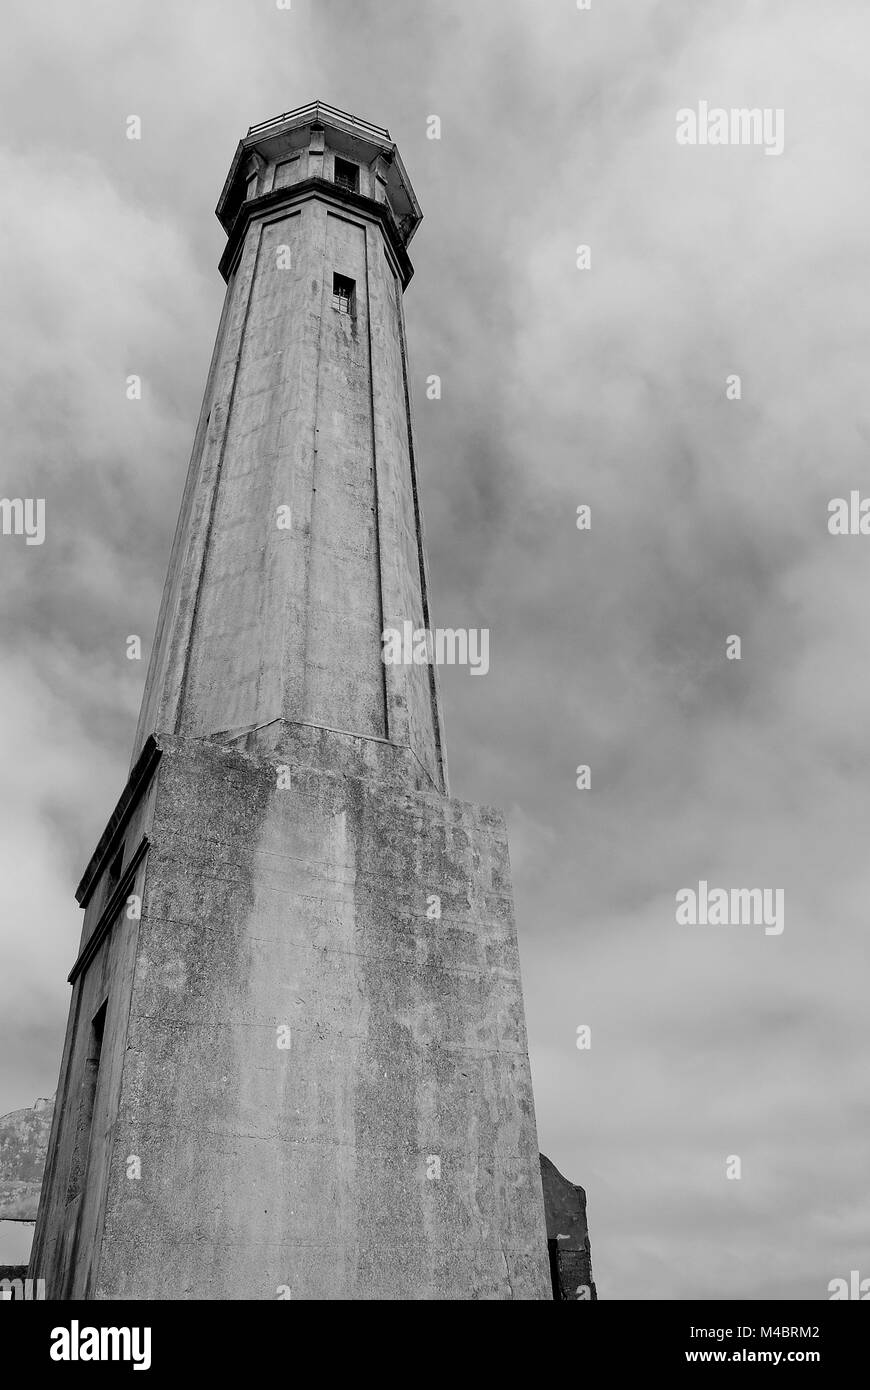 Alcatraz Island, Guard Watchtower, Cloudy Sky, Prison, Bay Area, San Francisco, California - Stock Image